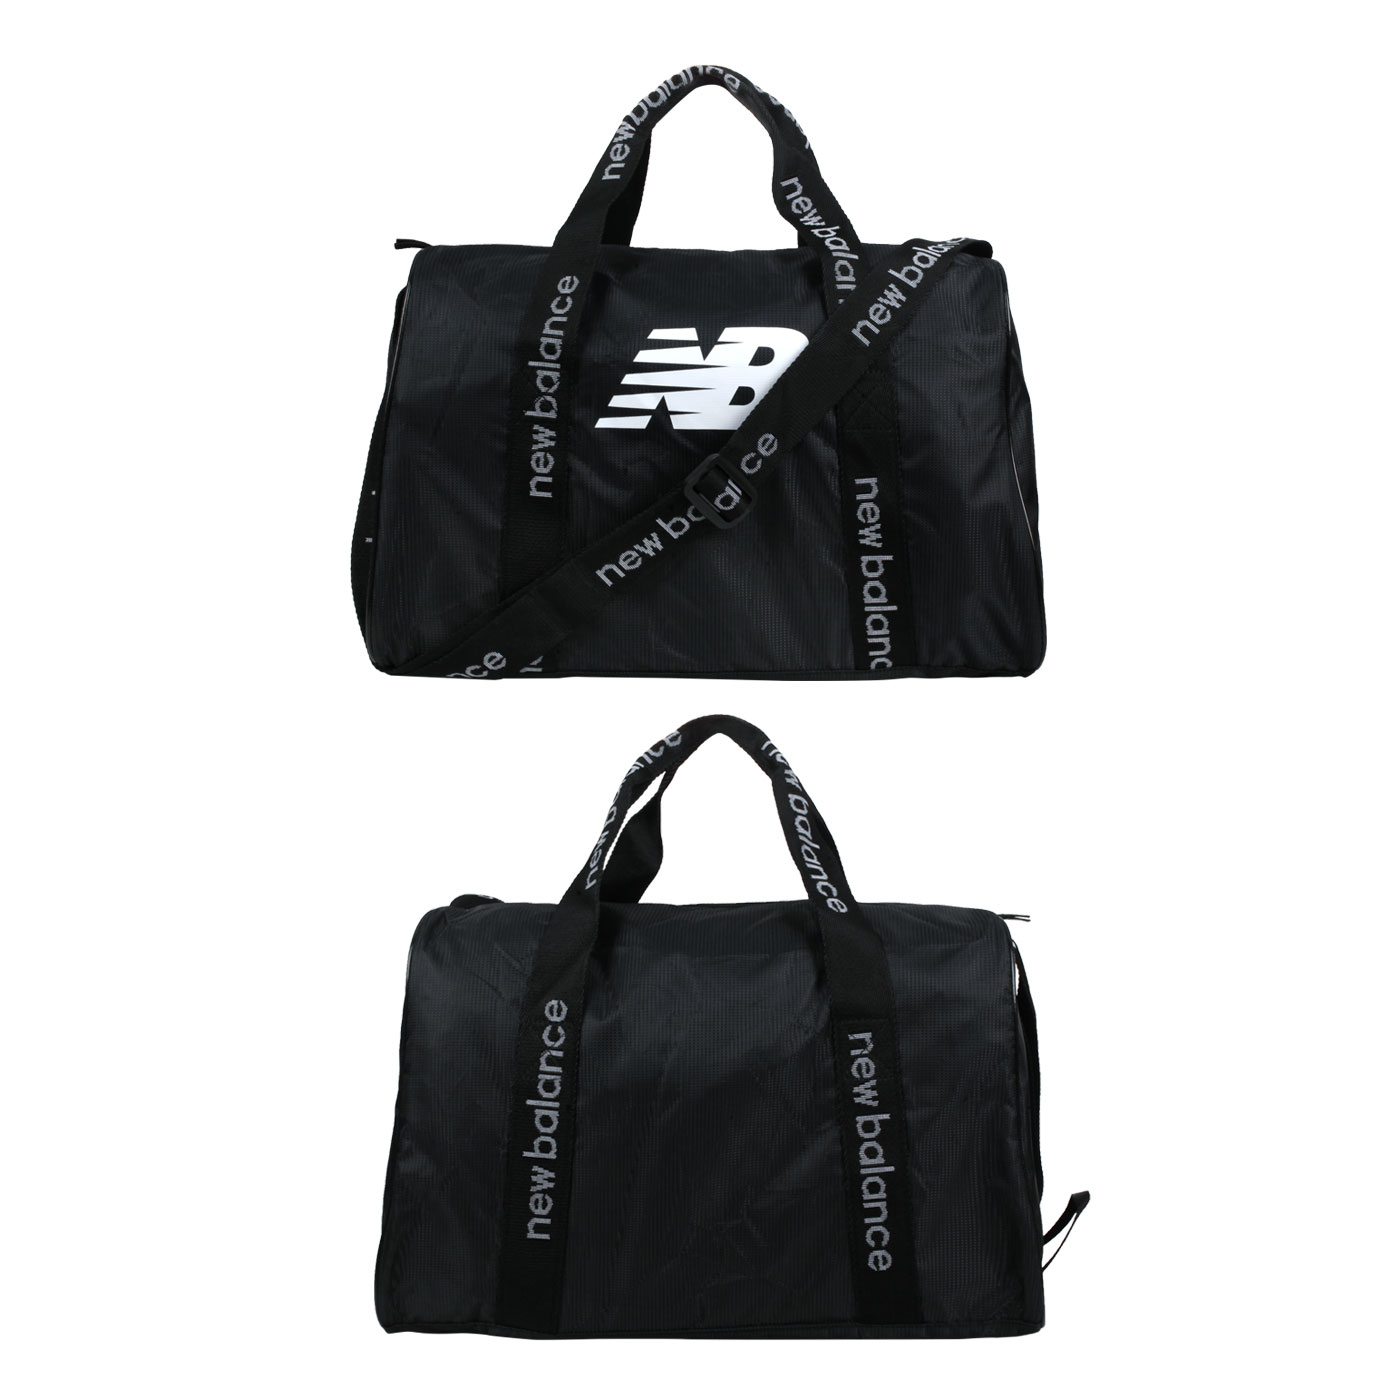 NEW BALANCE 運動提袋 LAB13102BK - 黑白